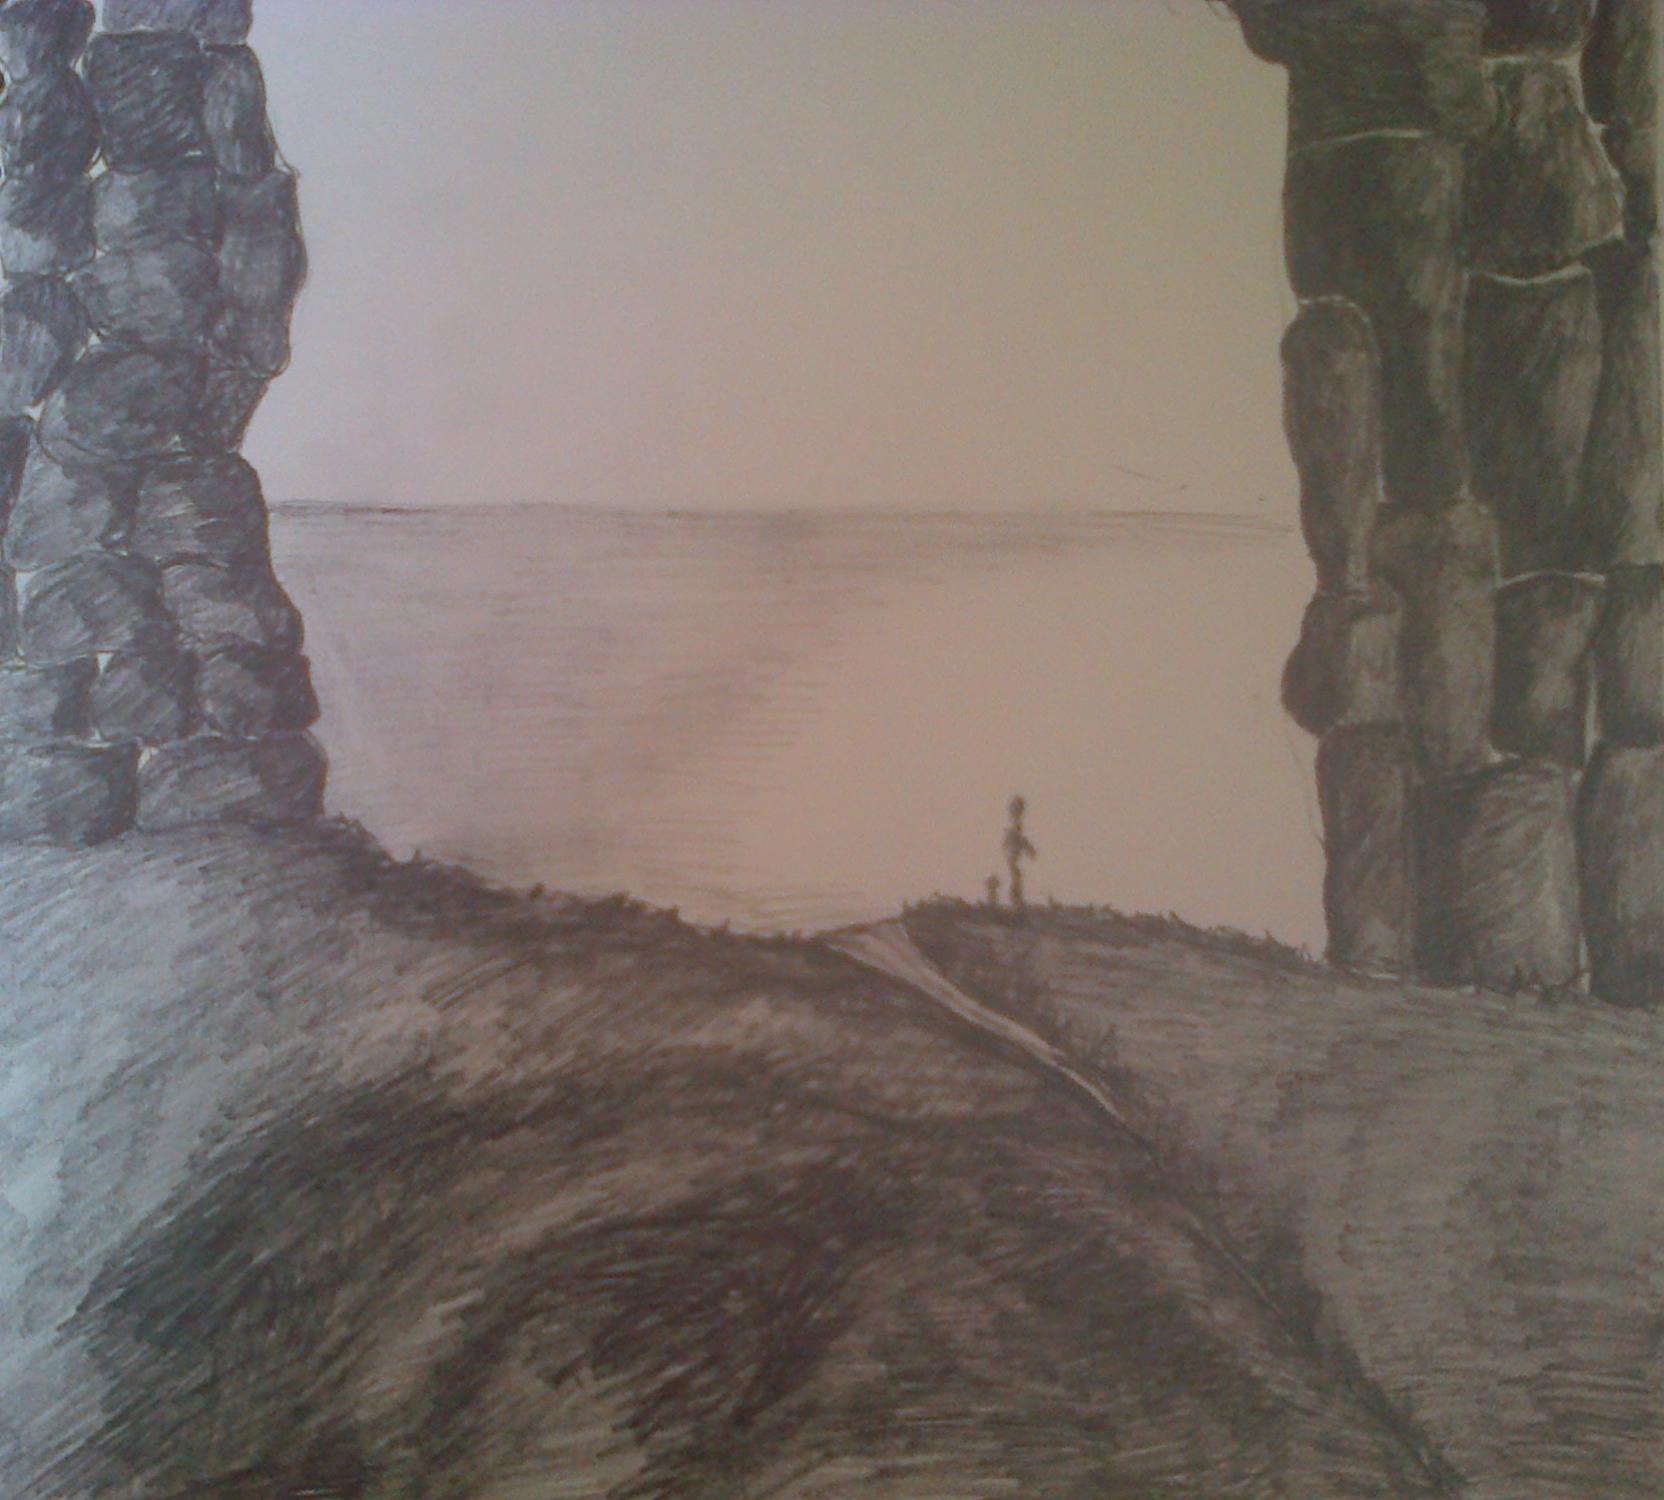 Sketch done at Scottish coast